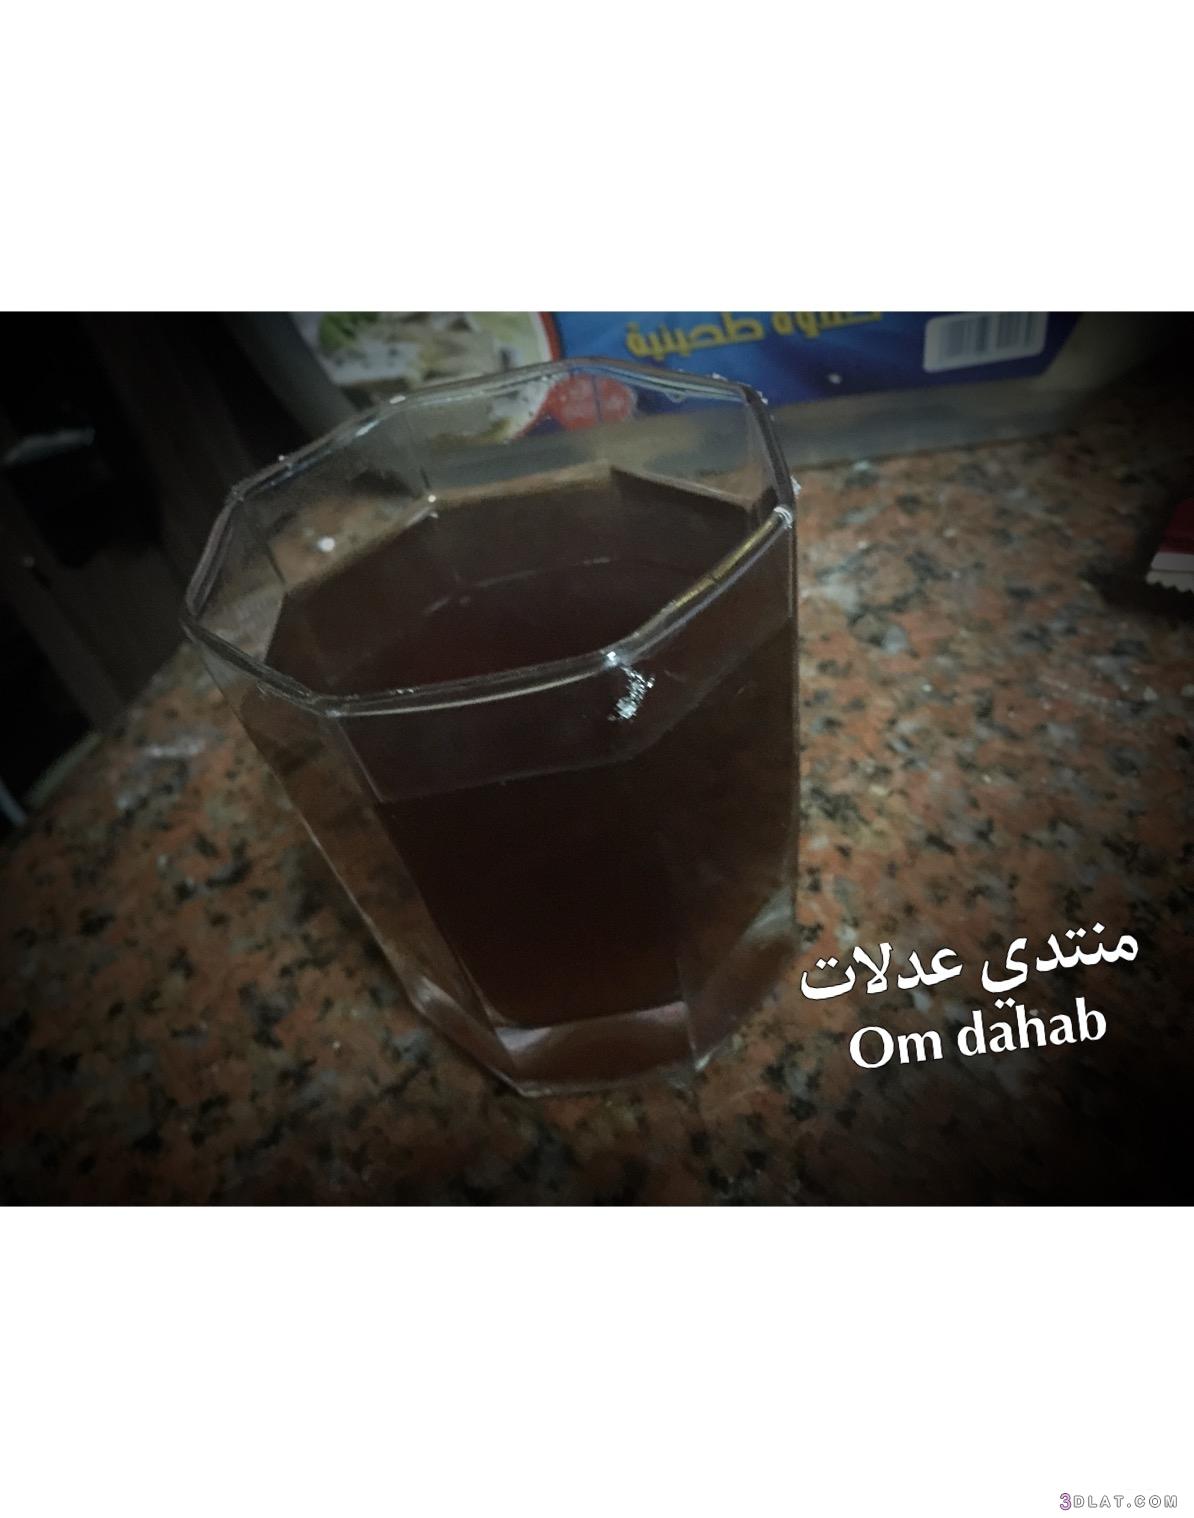 التمر, حصري،, رمضان, طريقه, لرمضان, مشروب, مشروبات, هندي, ٢٠١٩،